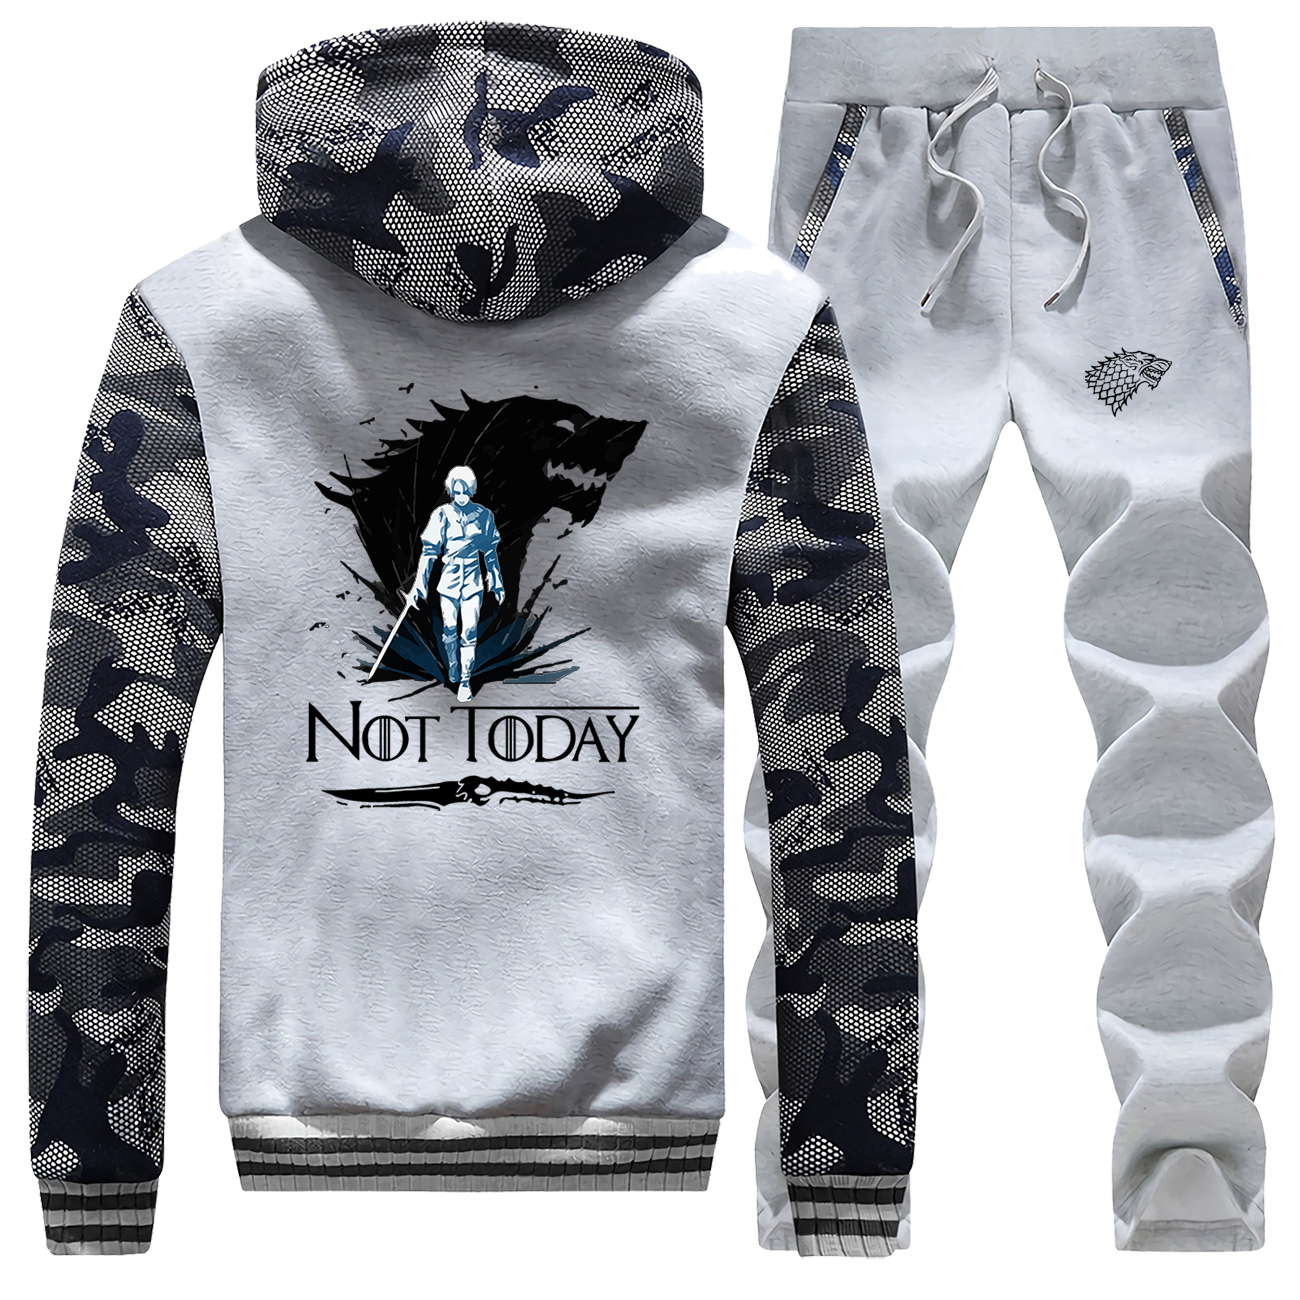 2019 Winter Thick Camo Set Men Game Of Thrones Tracksuit Not Today Arya Stark Pants Sweatshirts Warm Fleece Jackets New Male Set